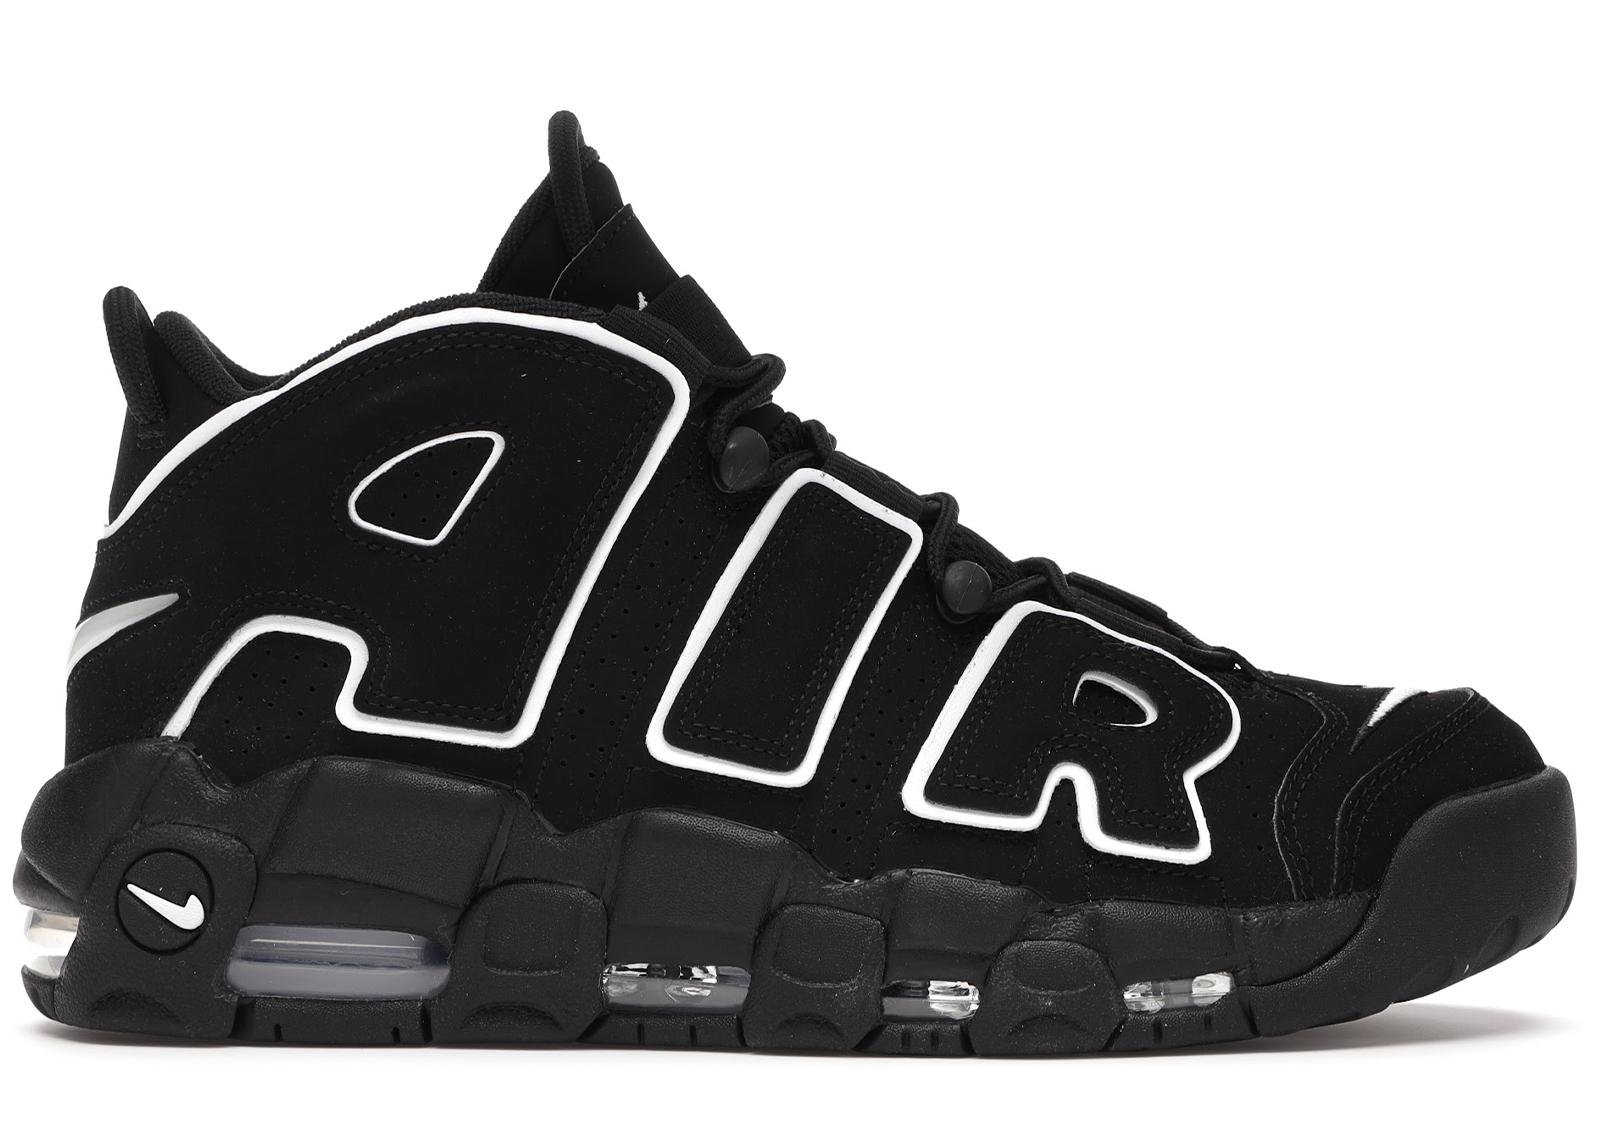 Nike Air More Uptempo Black White (2016/2020)